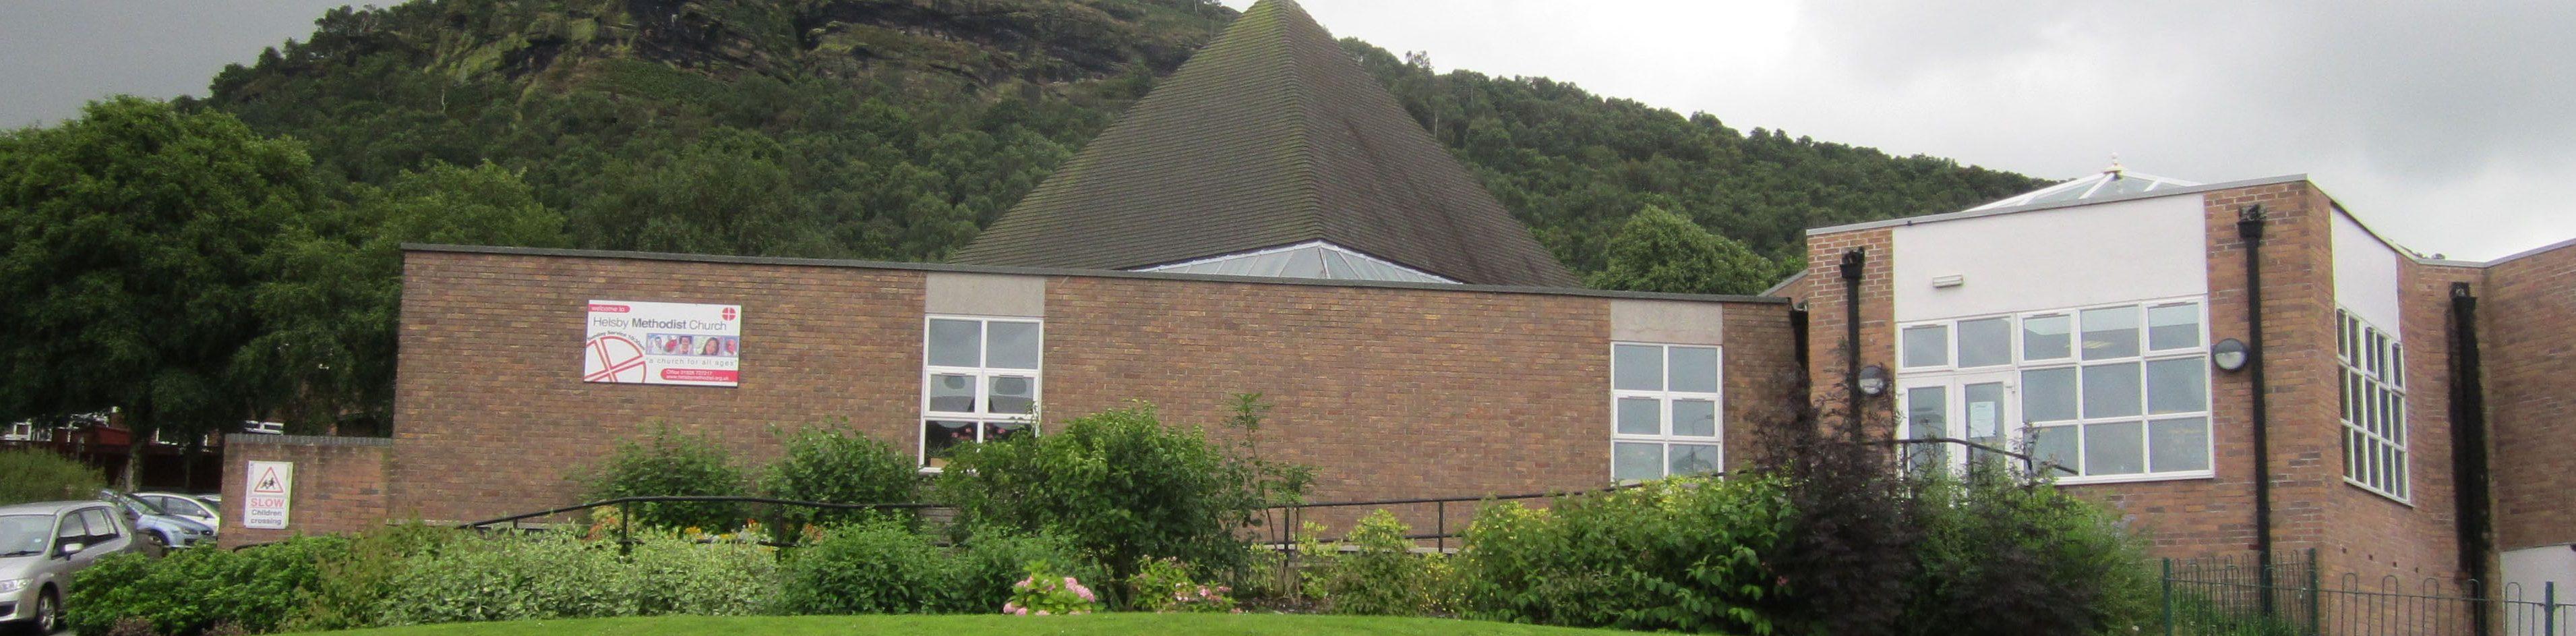 Helsby Methodist Church